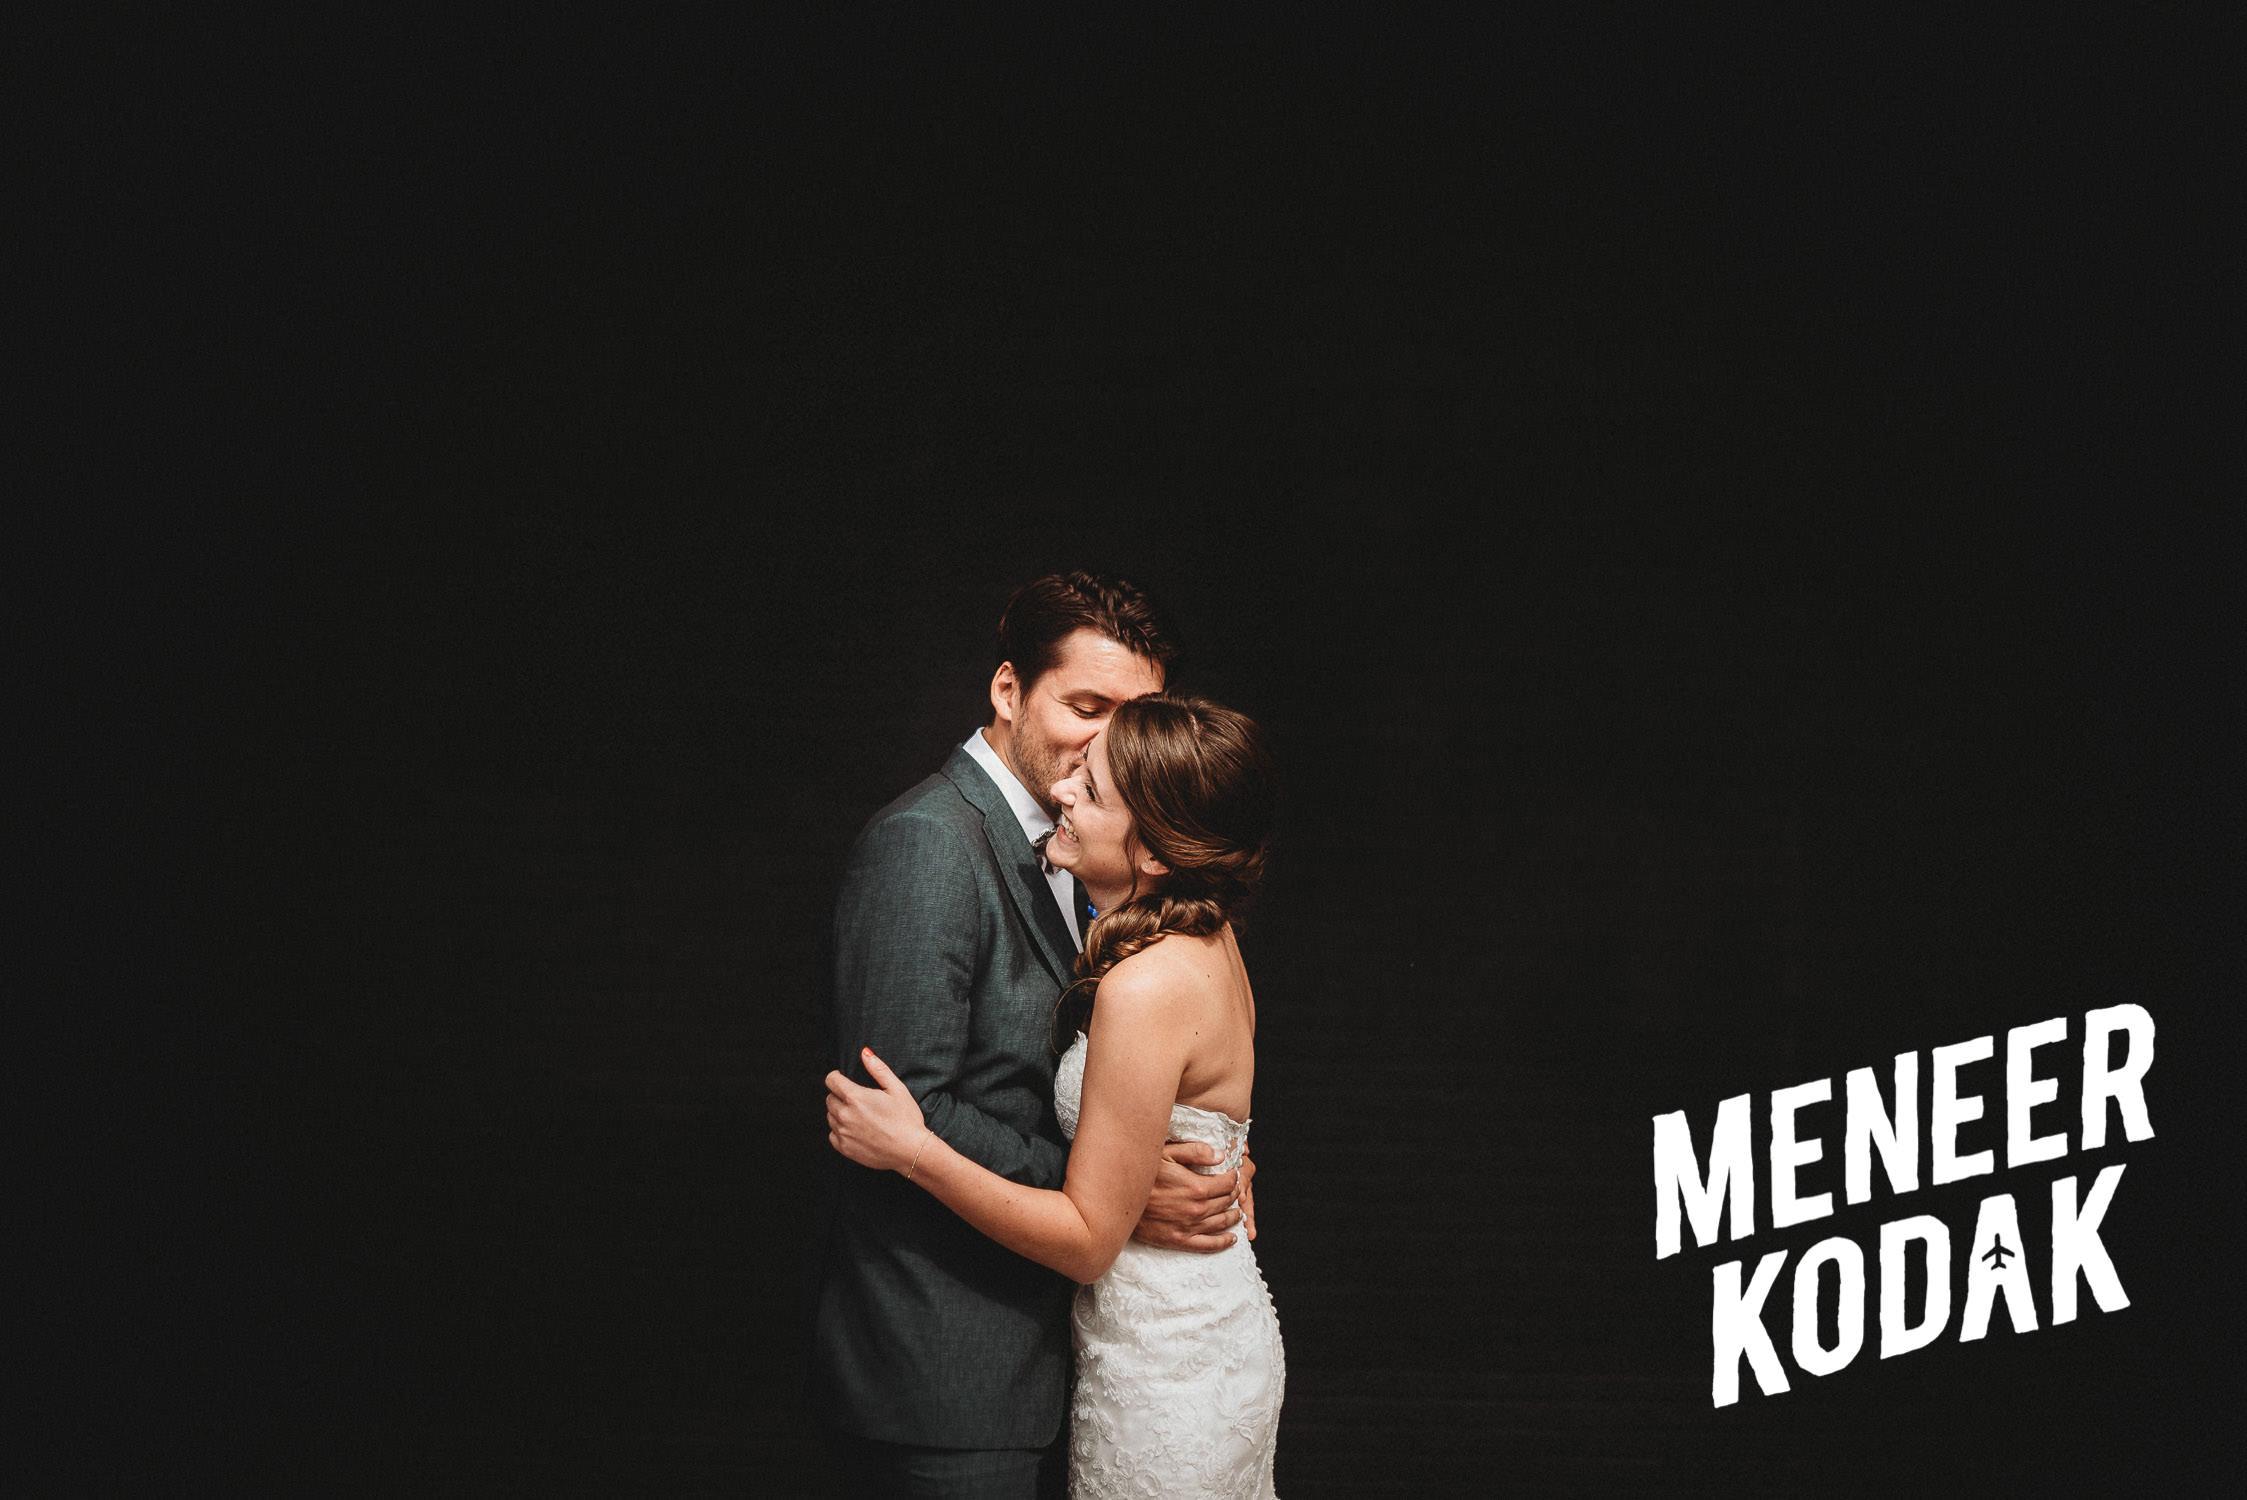 Meneer Kodak - Trouwreportage - Breda - E&M-077.jpg